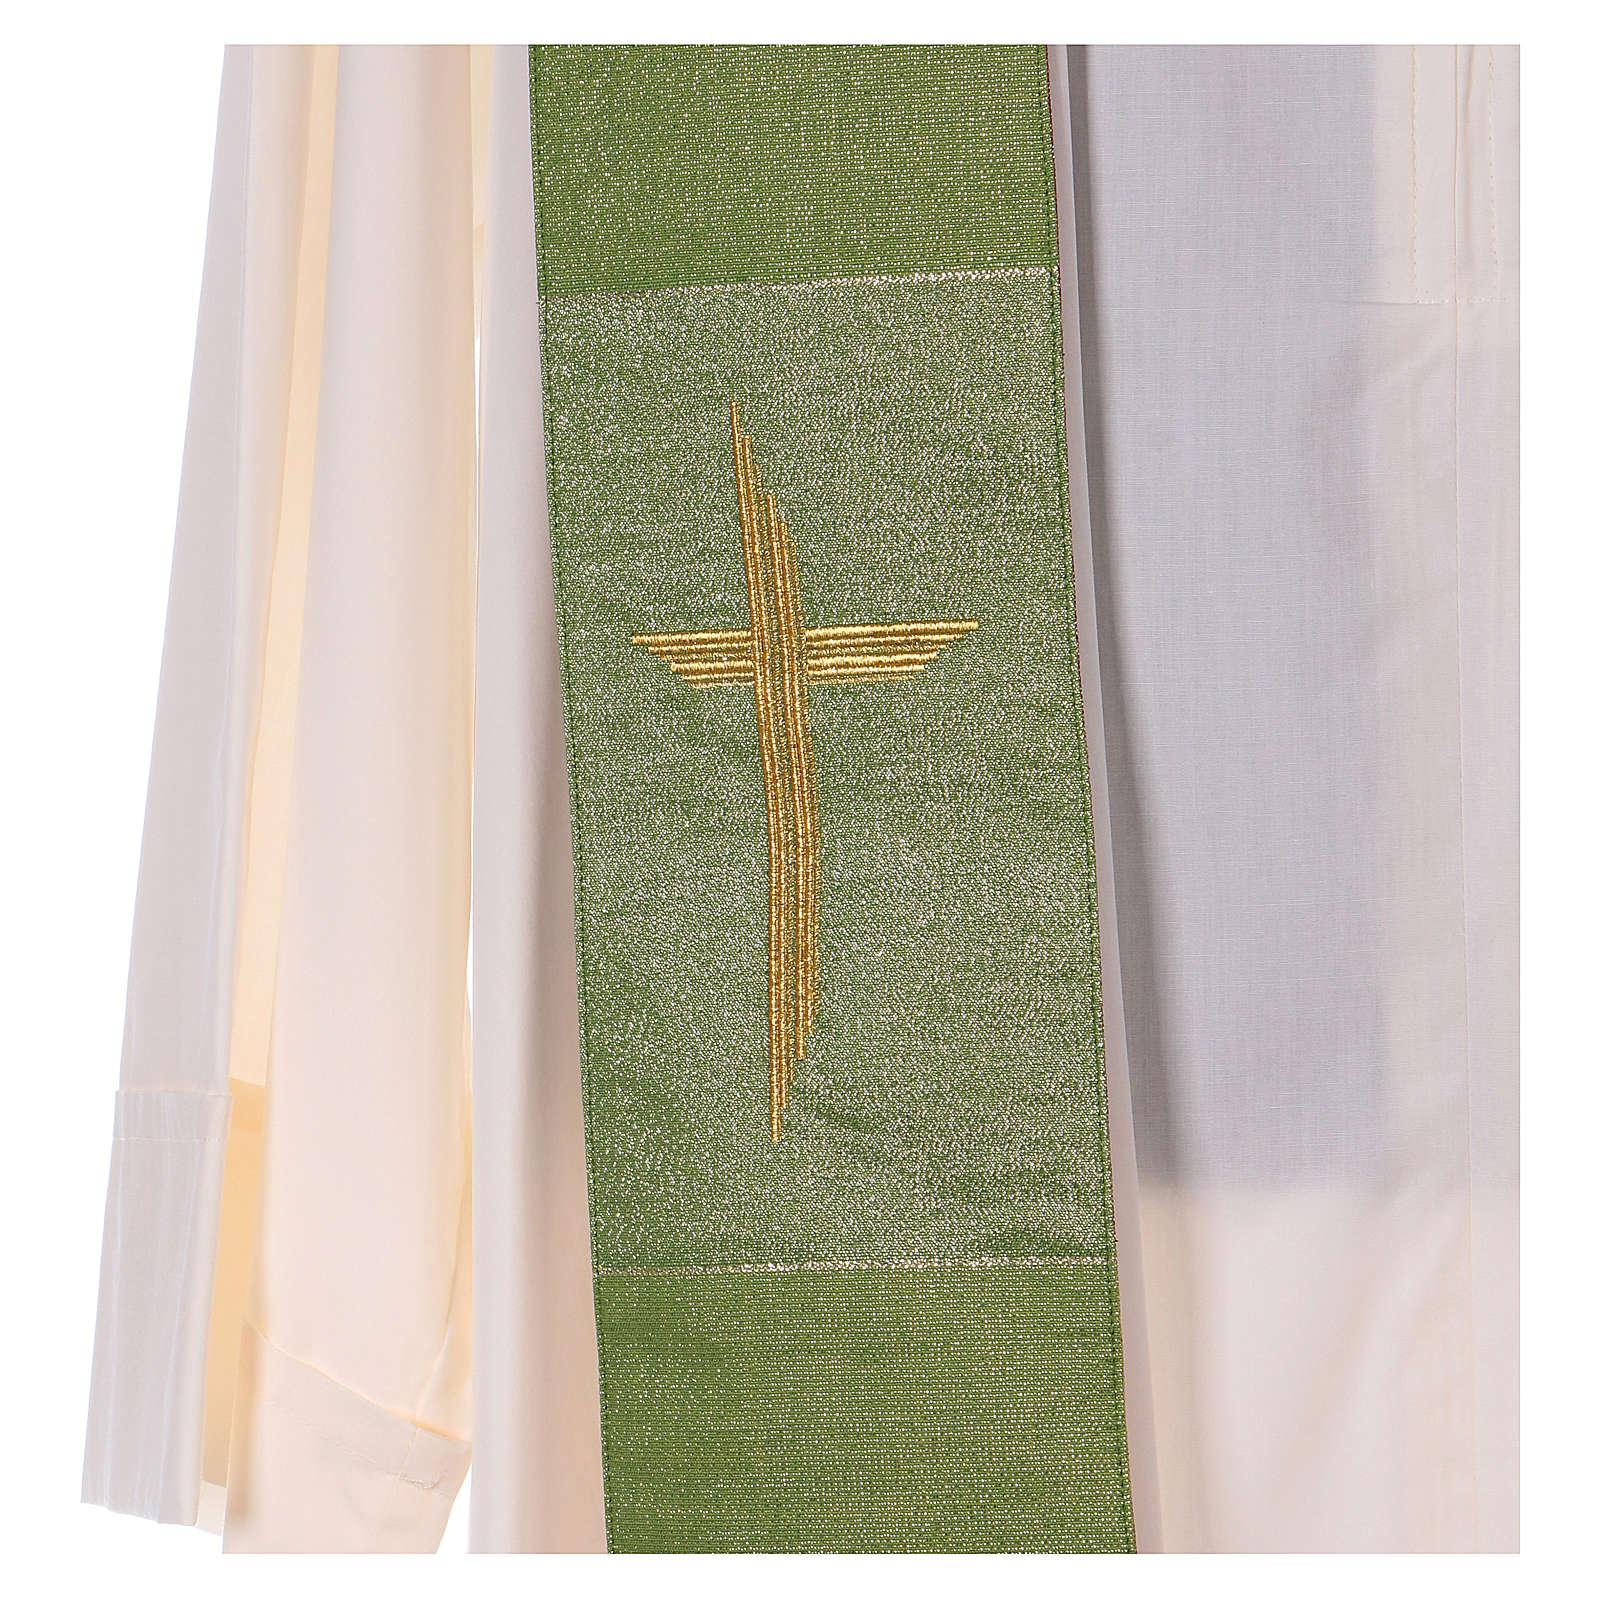 Estola reversible 85% lana 15% lurex con cruz dorada 4